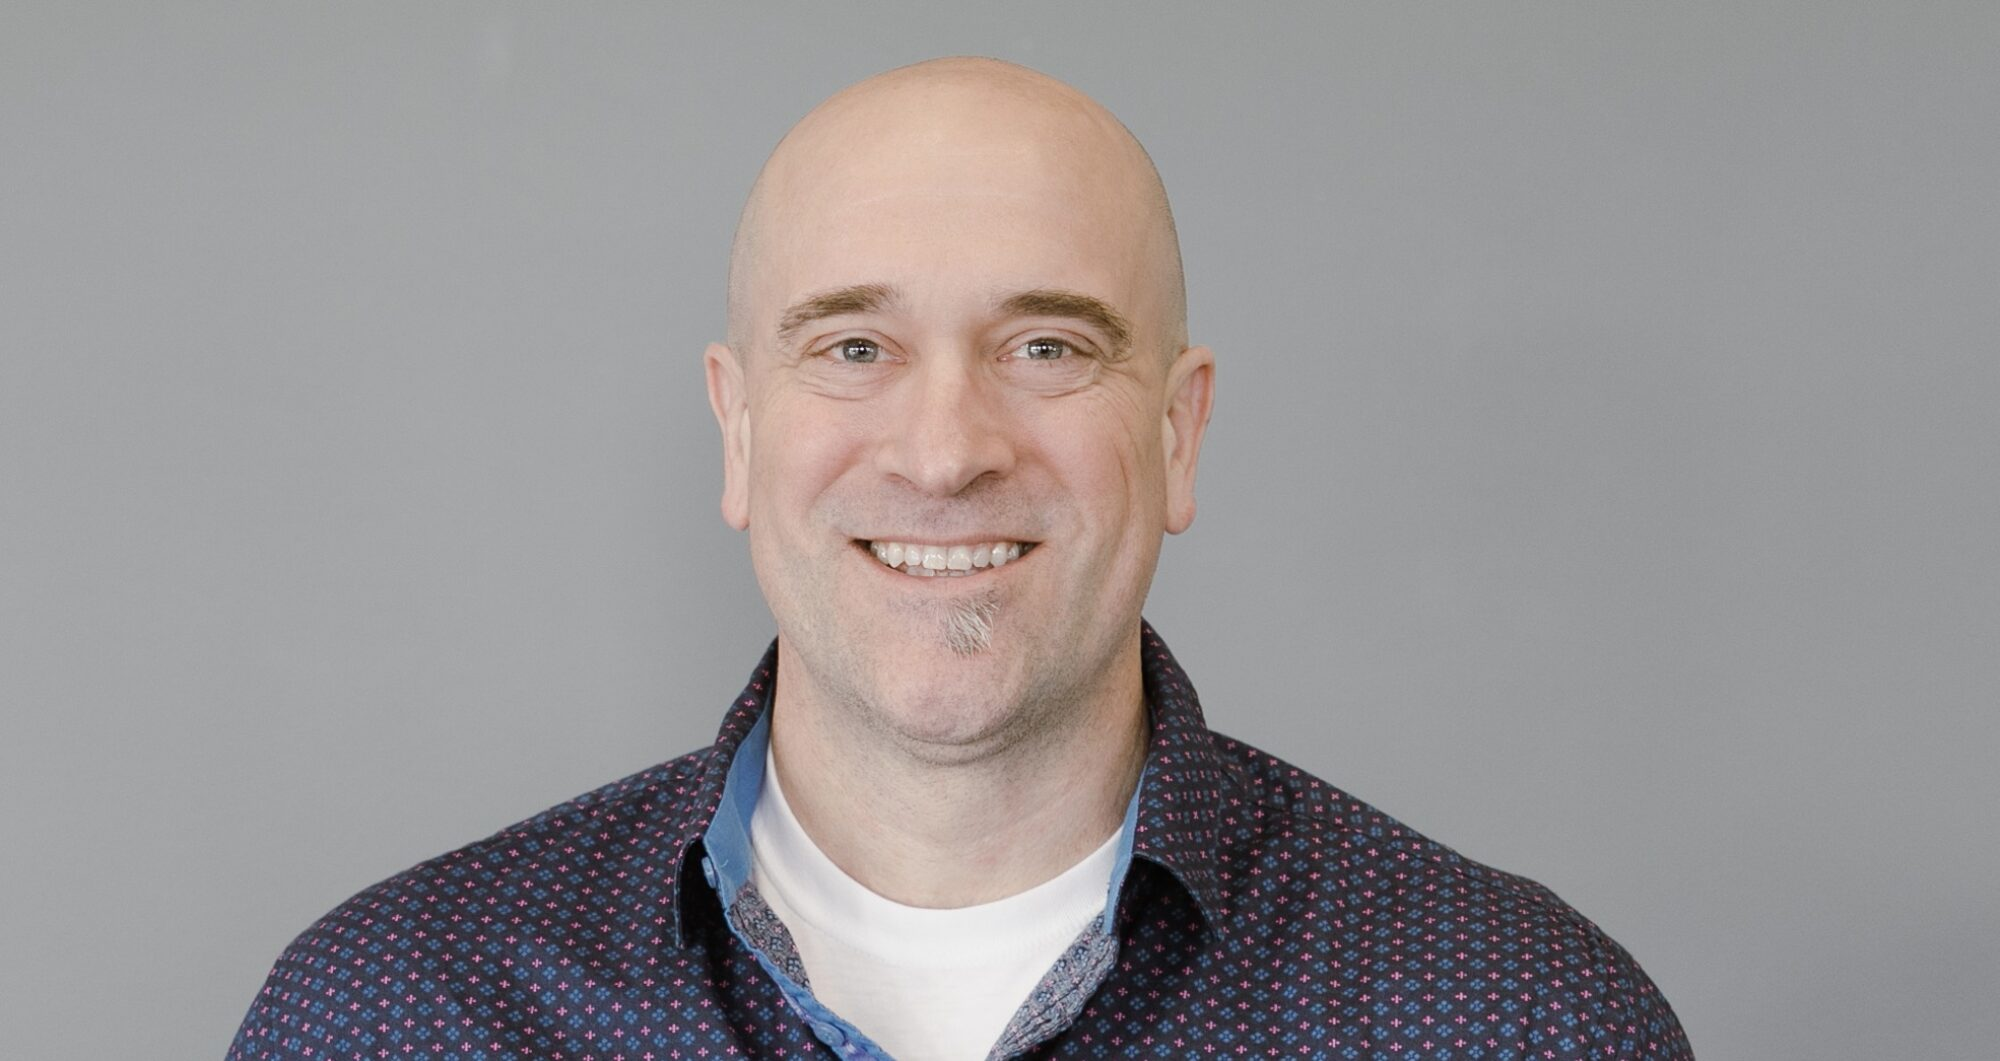 Chad Stutzman